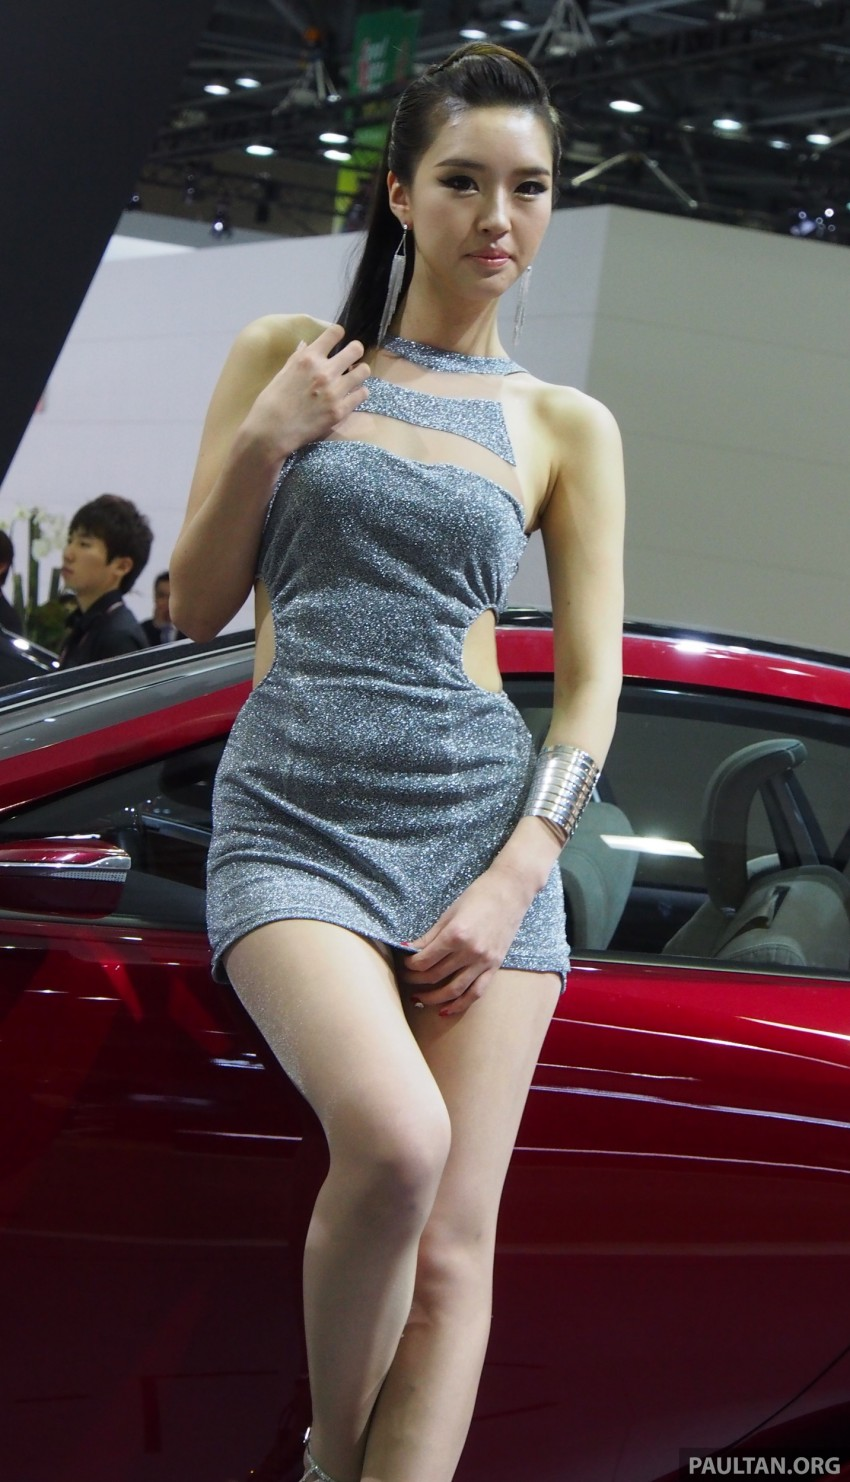 Seoul 2013 – Gangnam Girls say annyeong haseyo! Image #165315